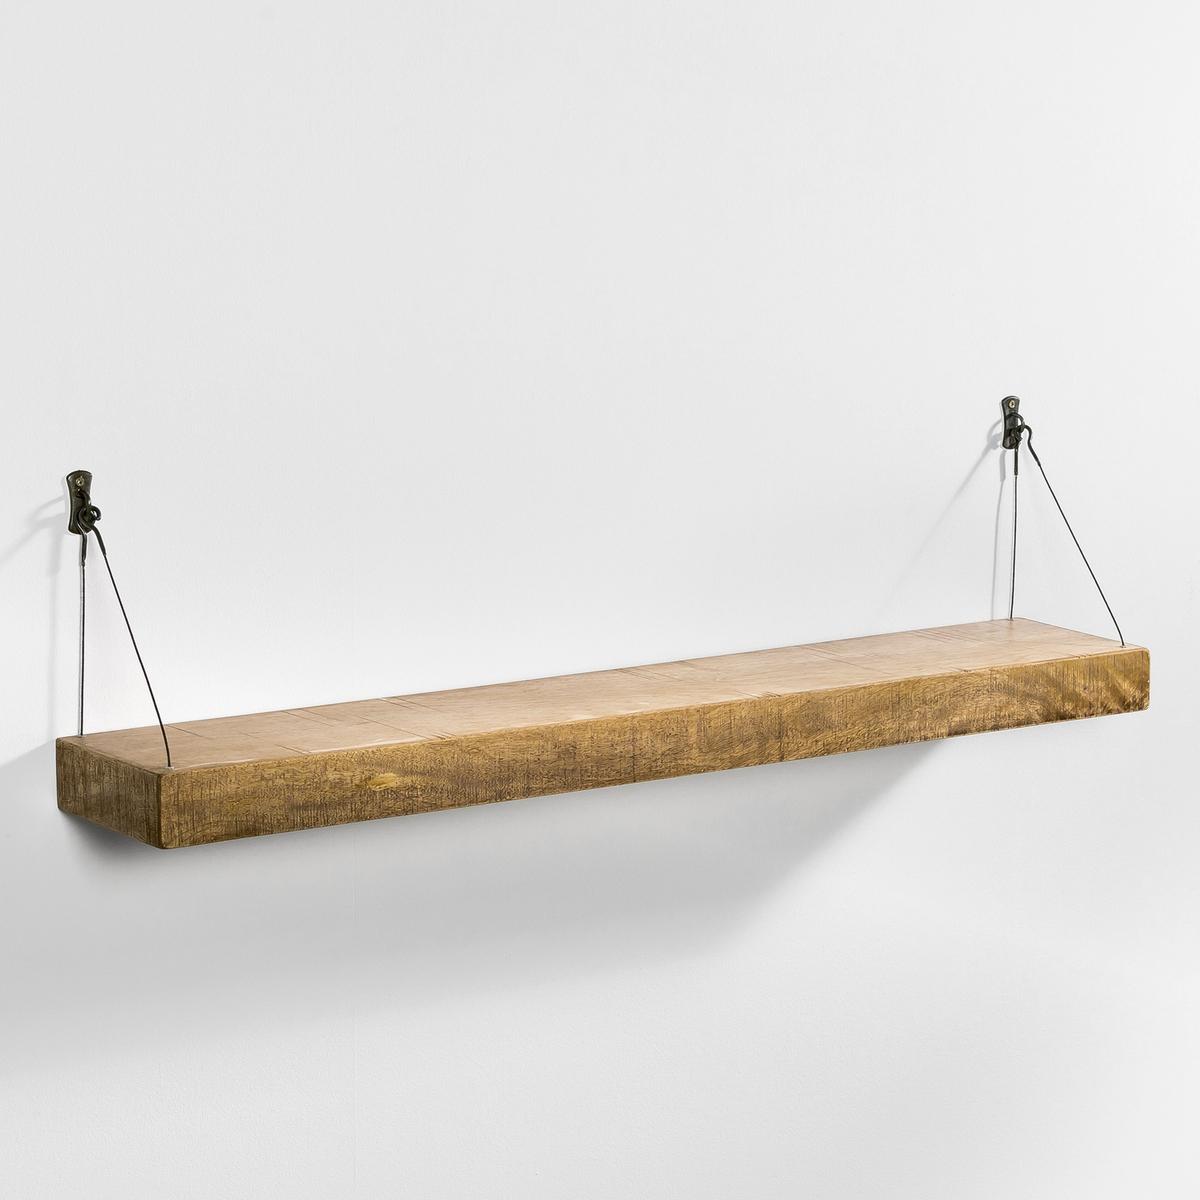 Полка настенная Дл. 110 см, Roots полка настенная наоми